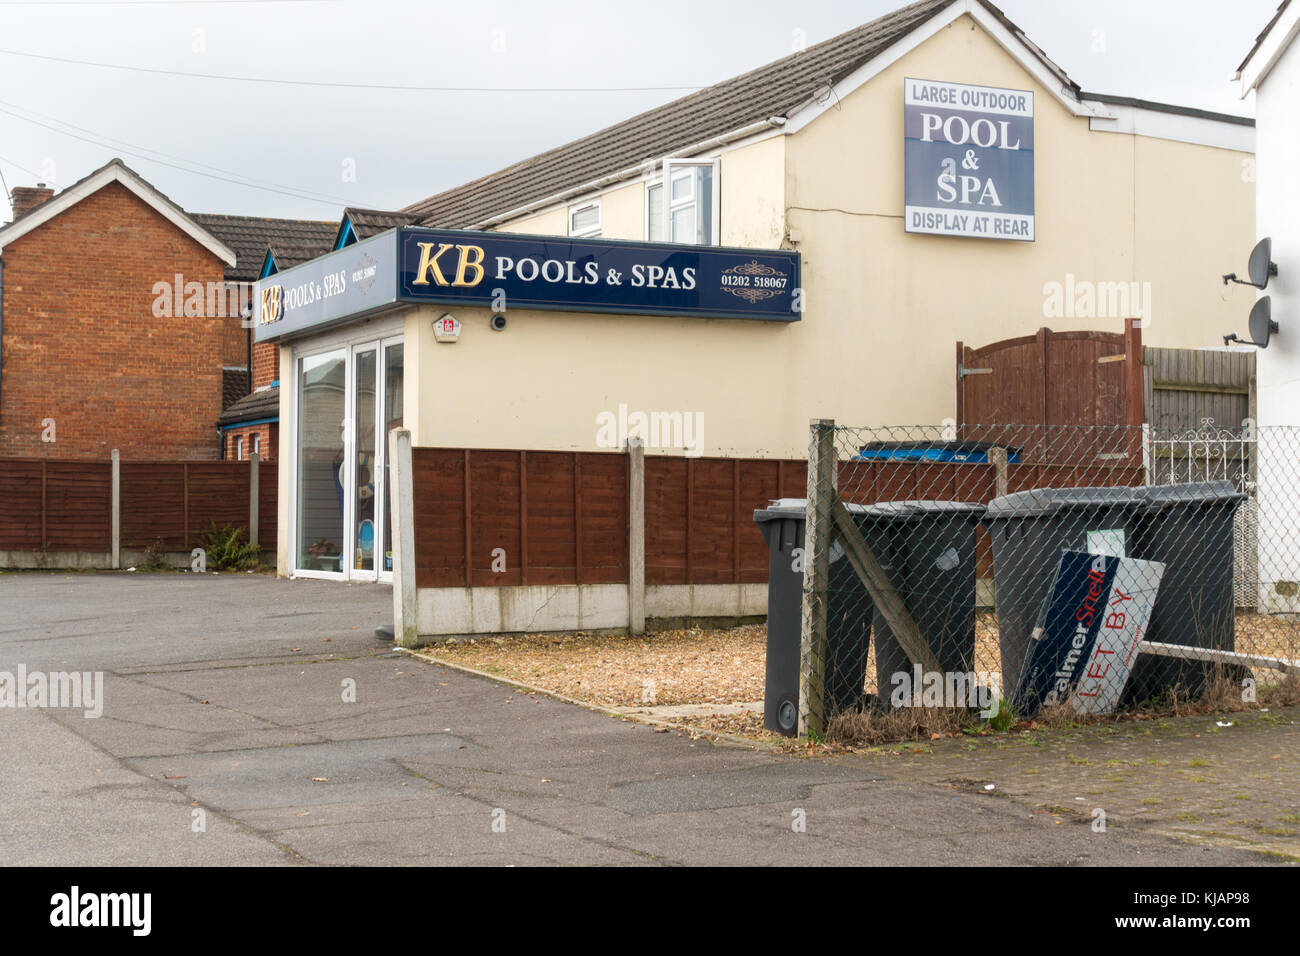 Refuse (wheelie) bins next door to a pools & spas showroom in Wallisdown, United Kingdom - Stock Image